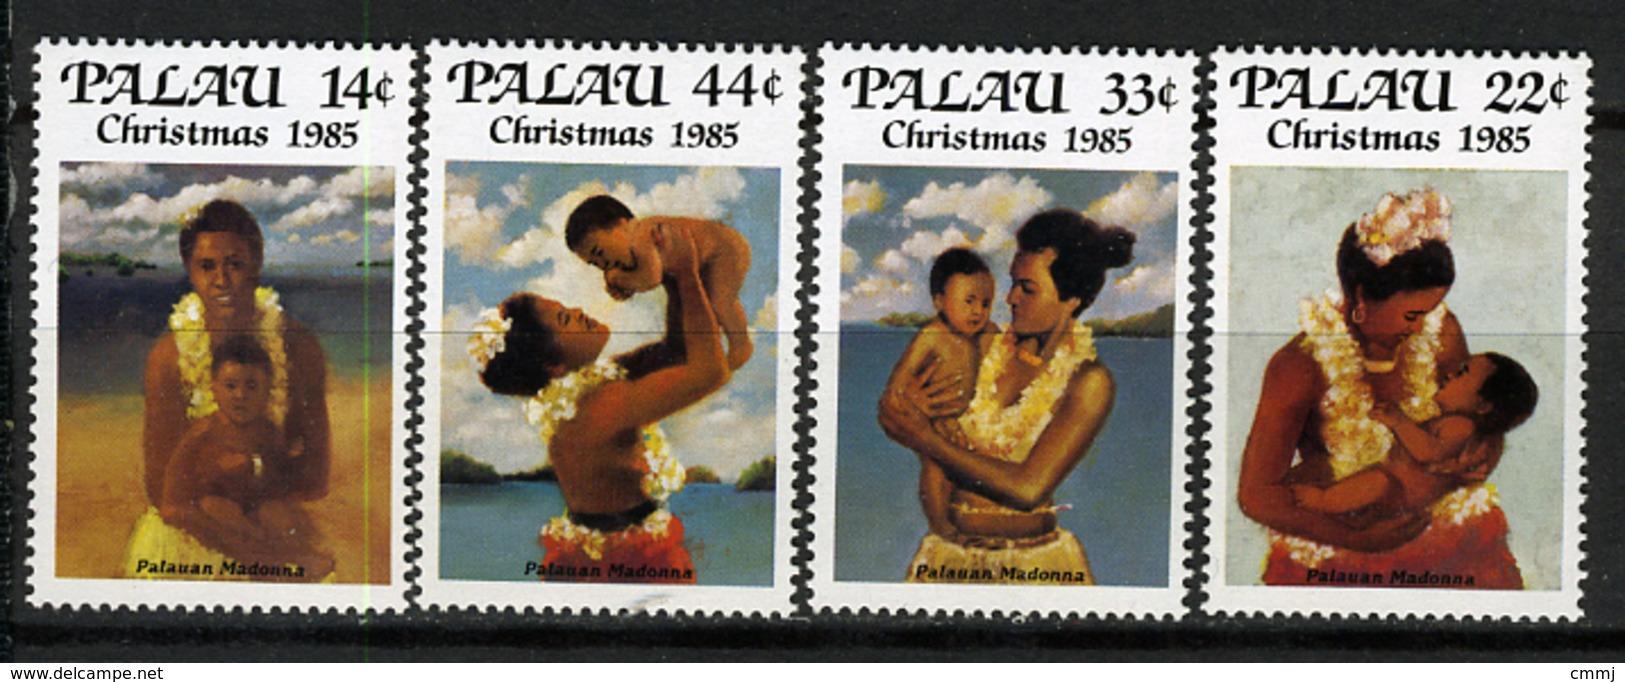 1985 - PALAU -  Catg.. Mi. 89/92 -  NH - (I-SRA3207.34) - Palau